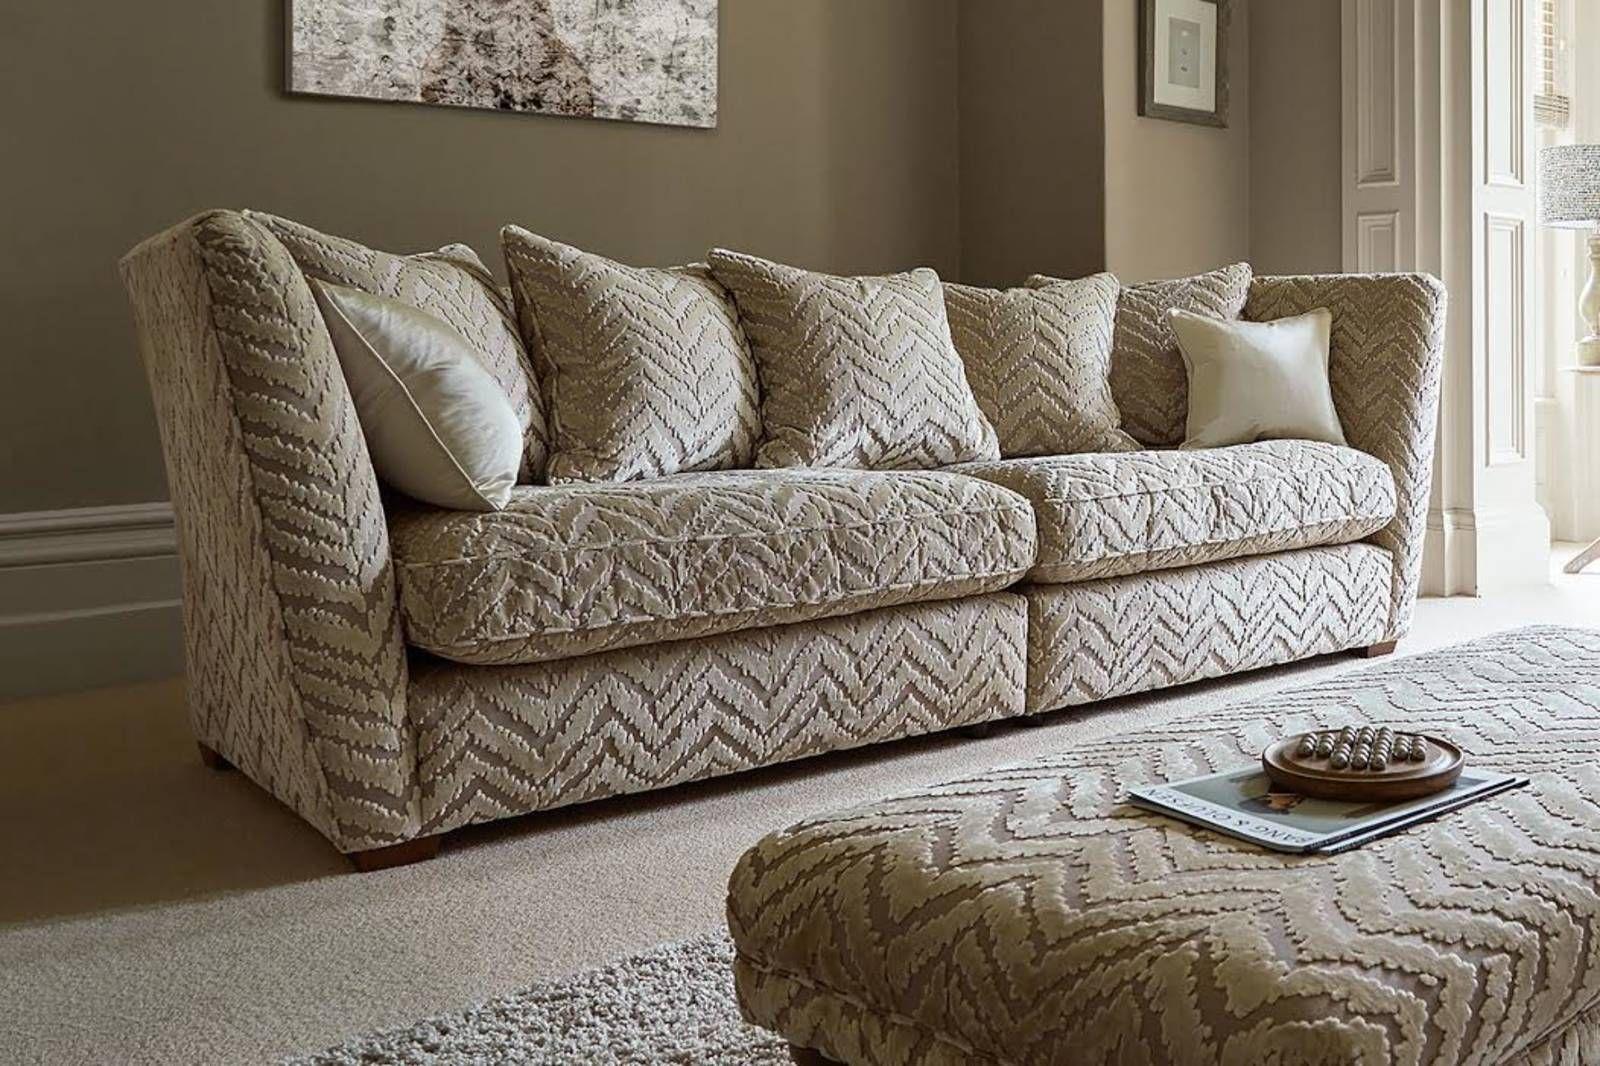 Richmonde | Sofology | Green leather sofa, Sofa, Leather sofa